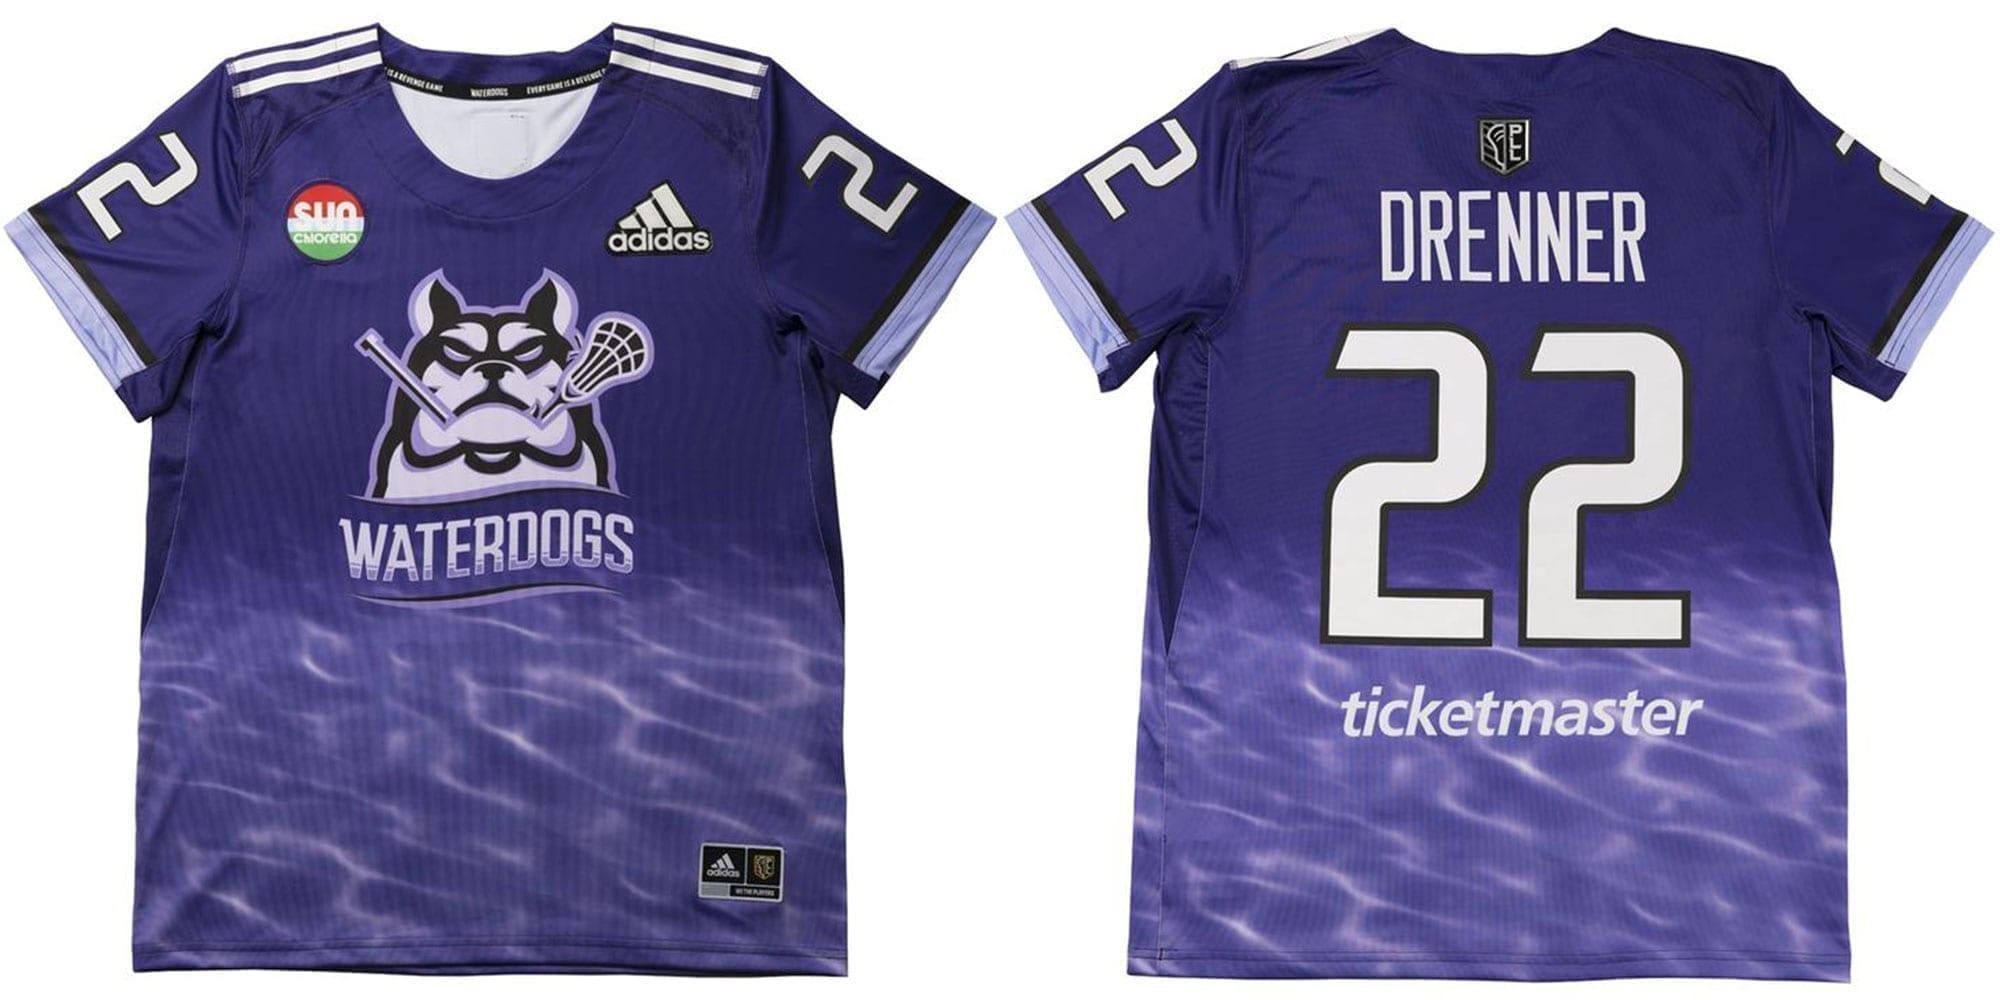 Waterdogs LC PLL 2020 Jersey uniform